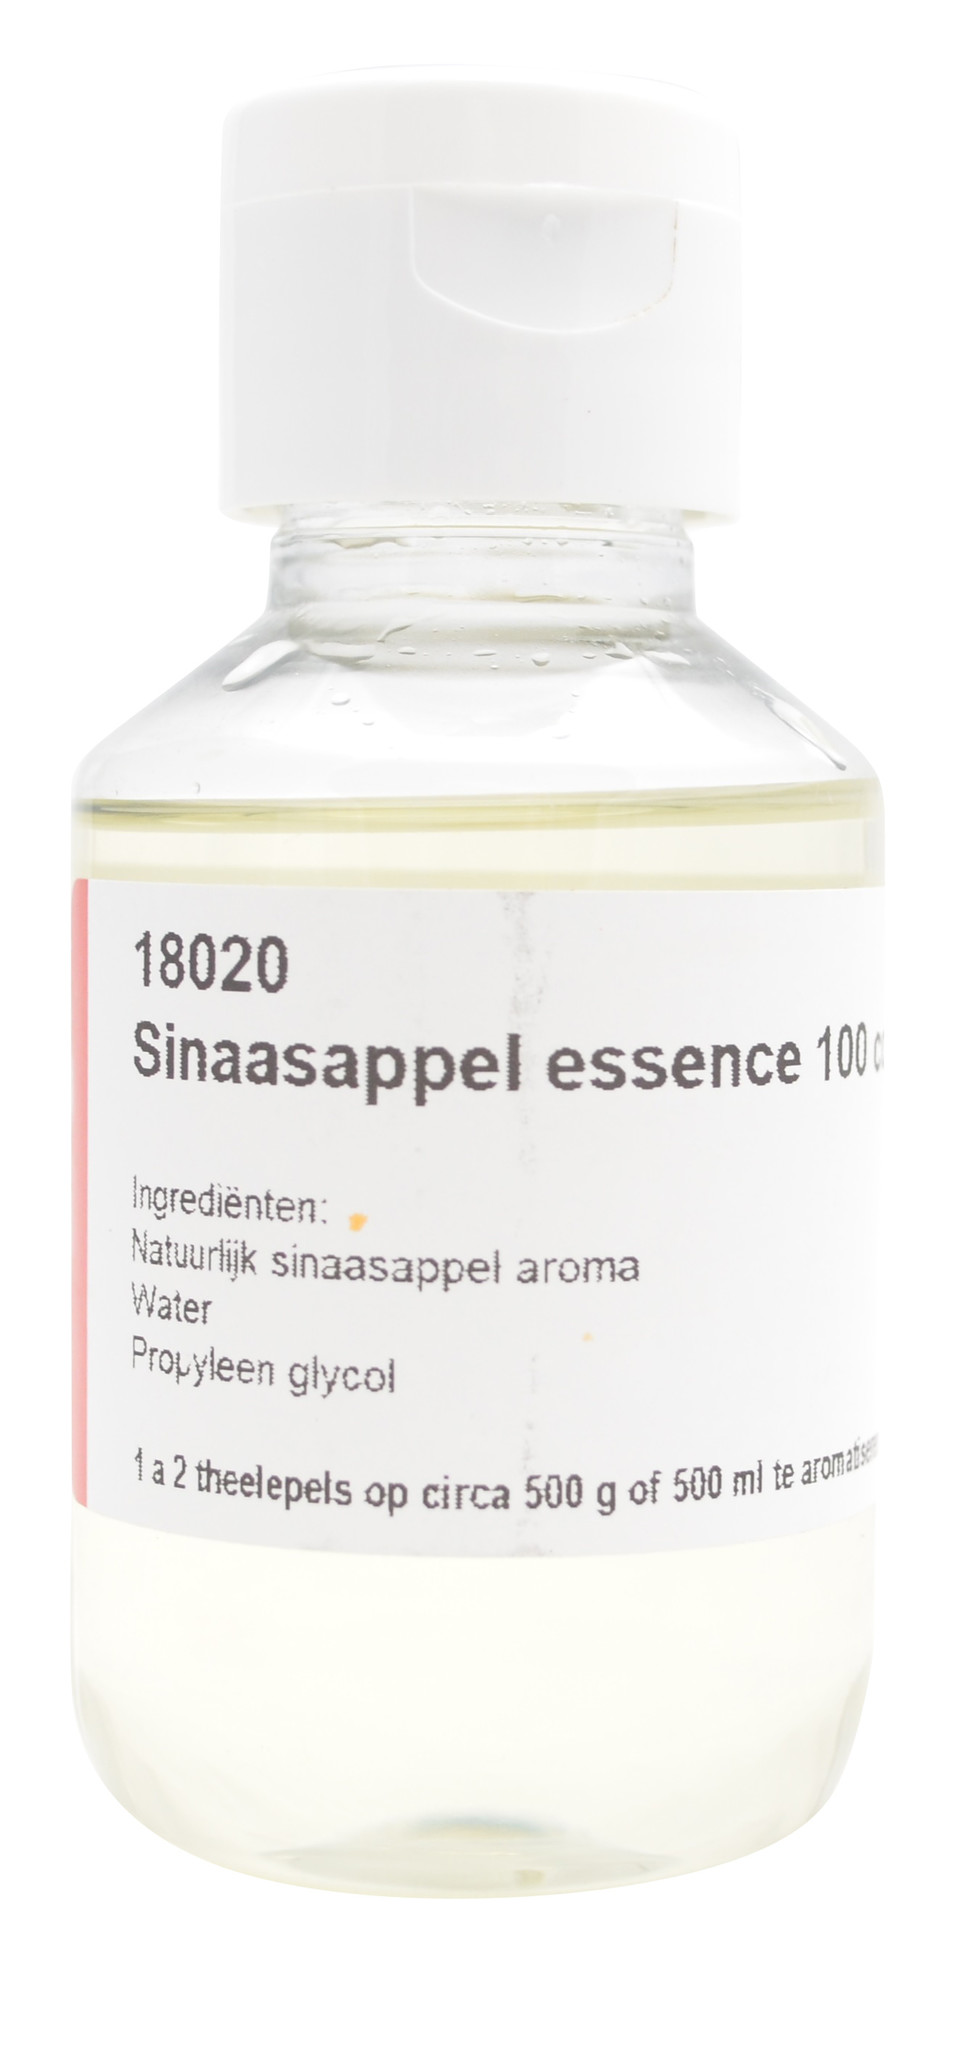 Sinaasappel essence 100 cc